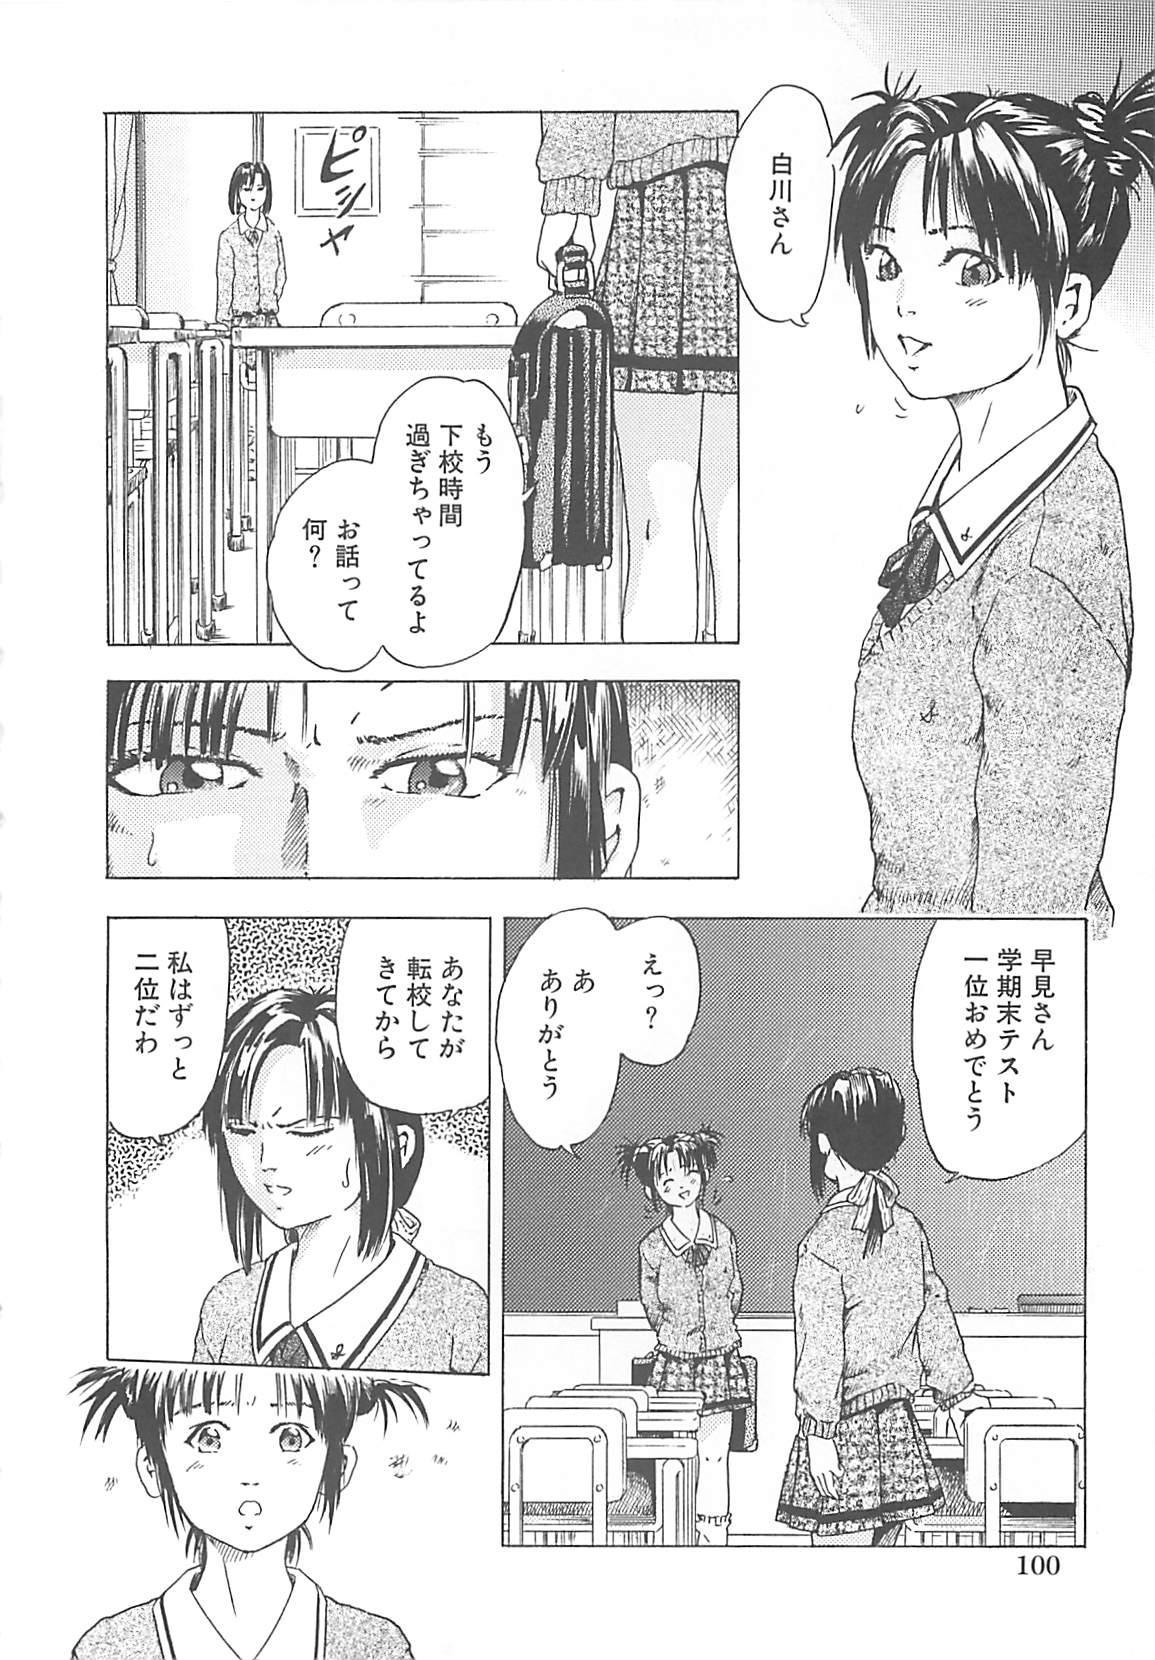 Kanin Kyoushitsu - Adultery Classroom 100